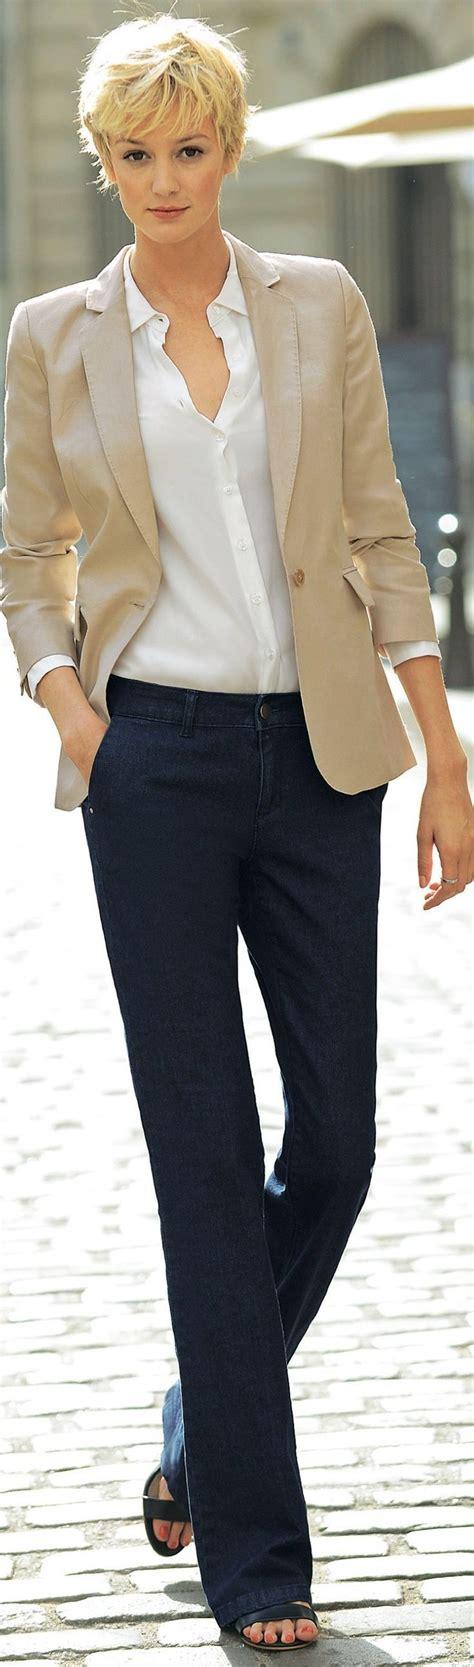 fashion women 50 tips styleskier